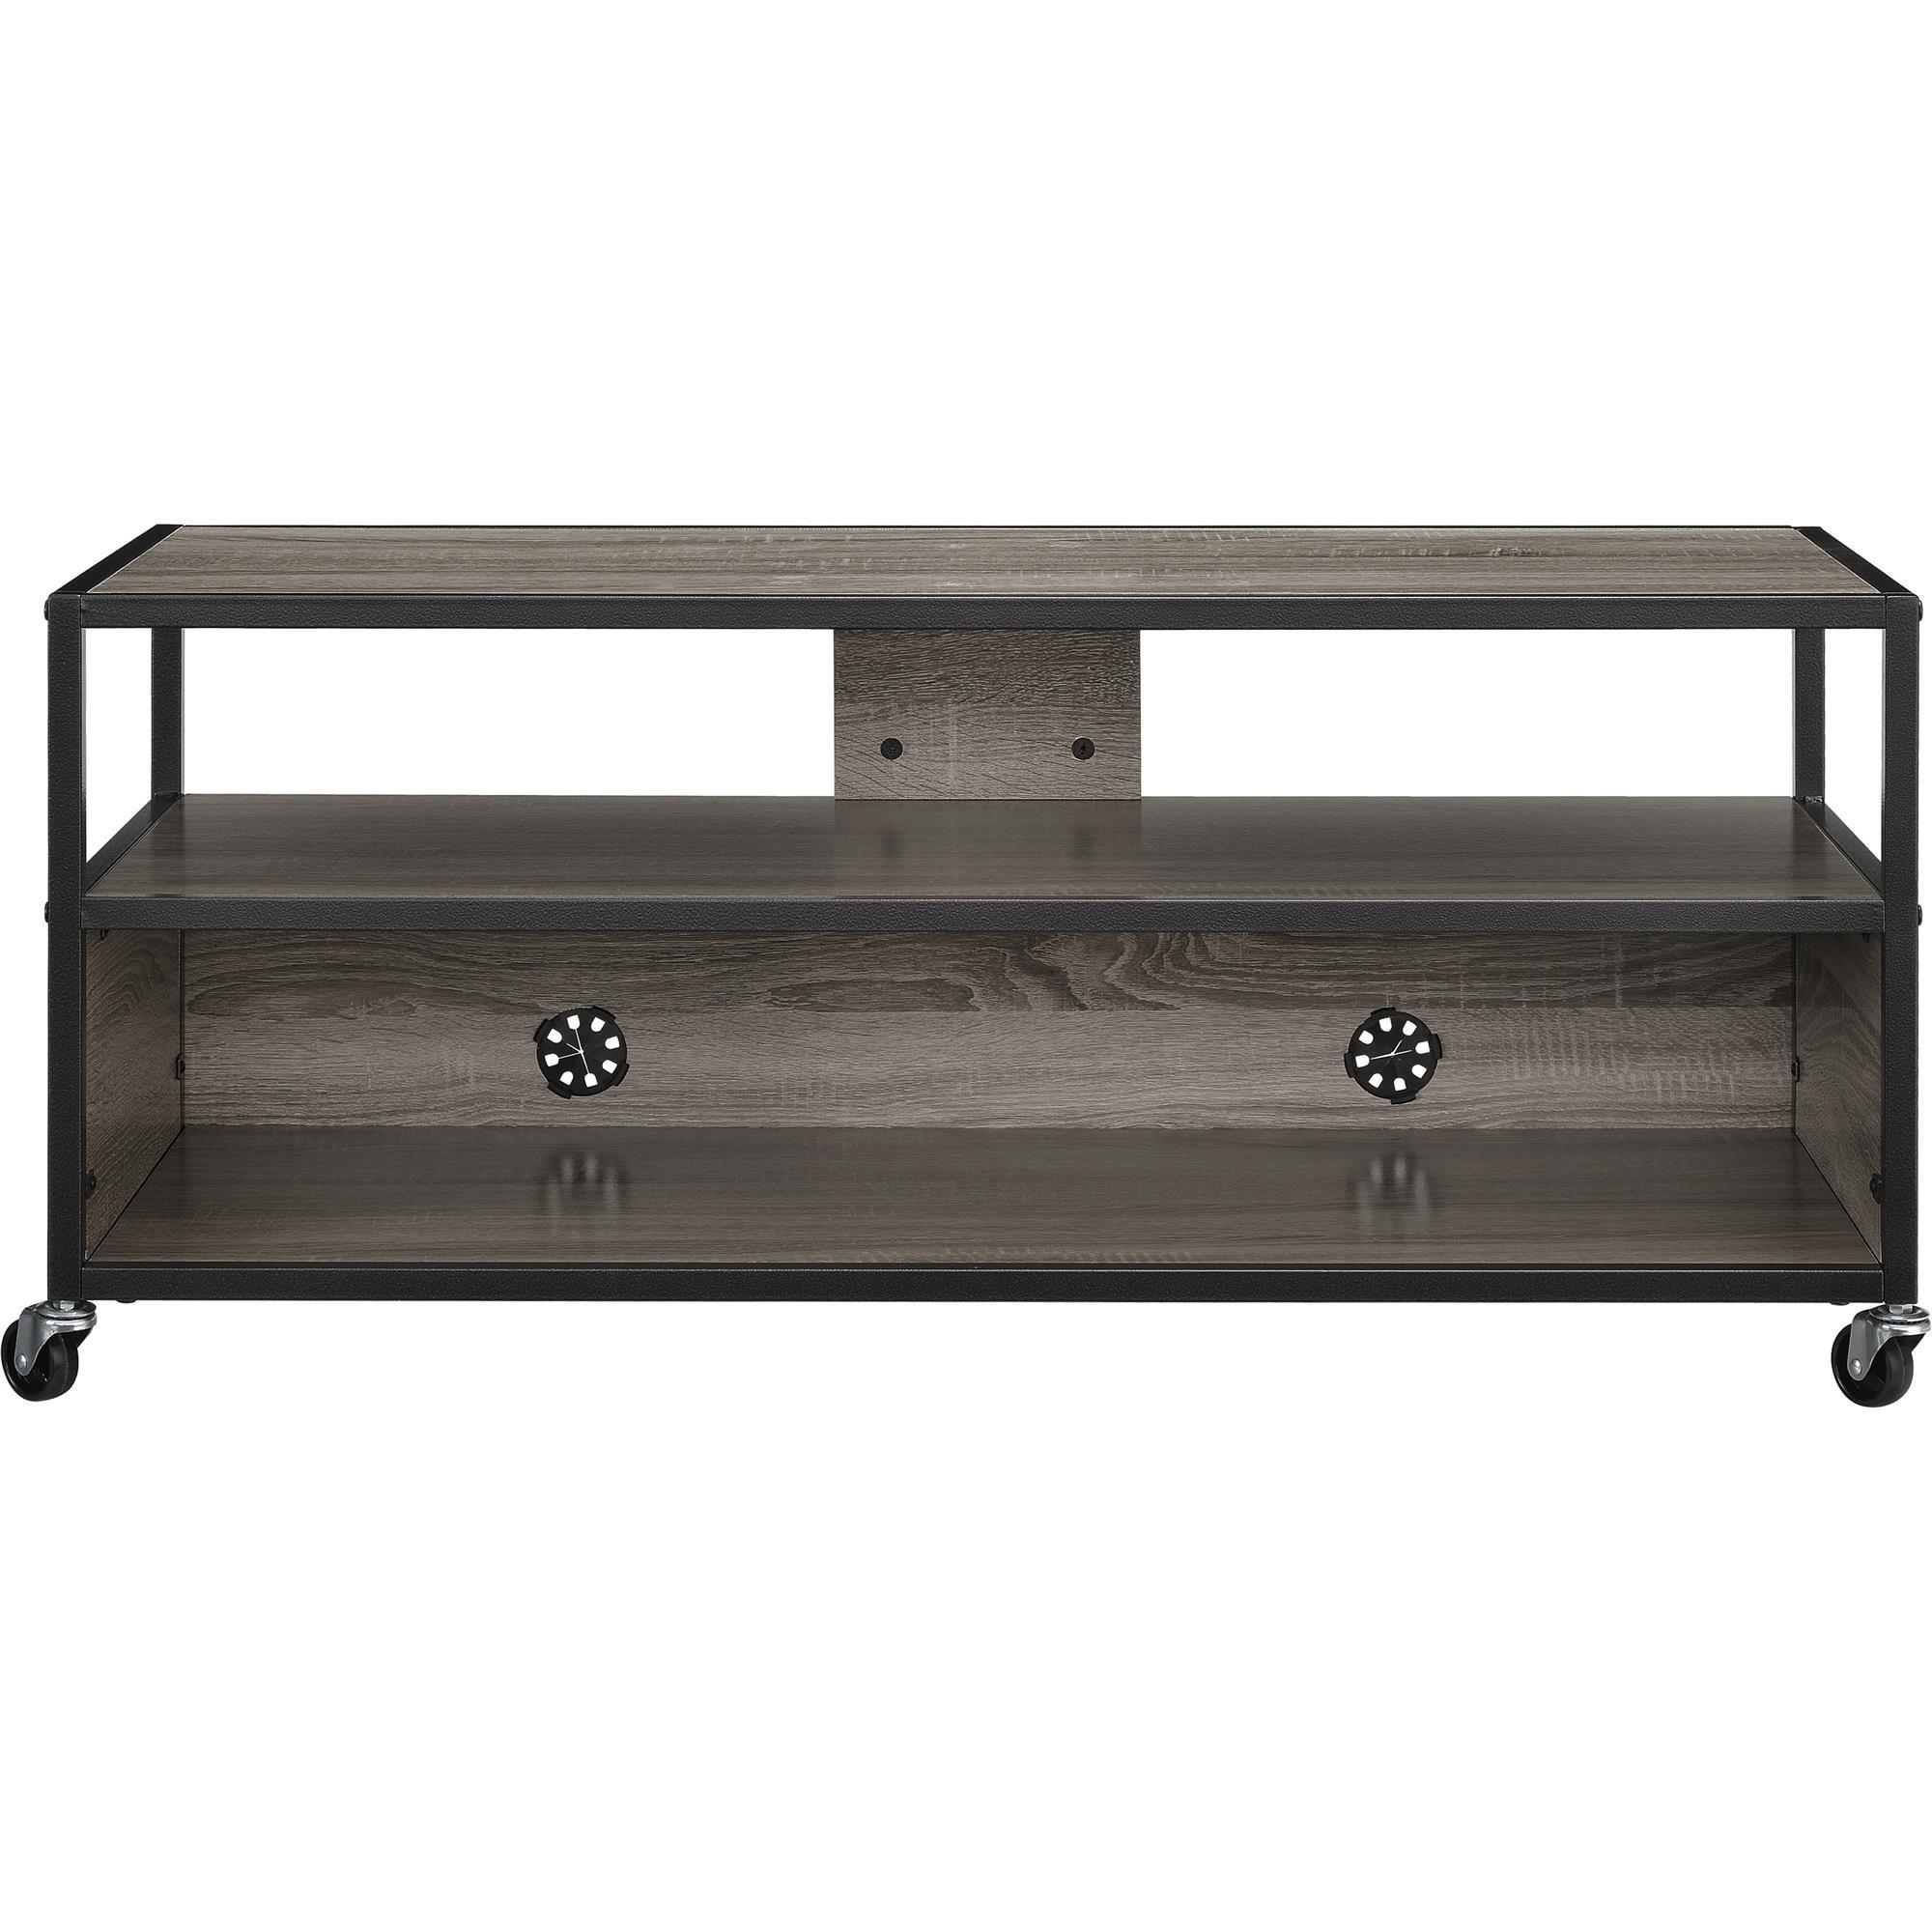 Altra Mason Ridge Mobile 46'' TV Stand with Metal Frame, Sonoma Oak/Black by Altra Furniture (Image #4)